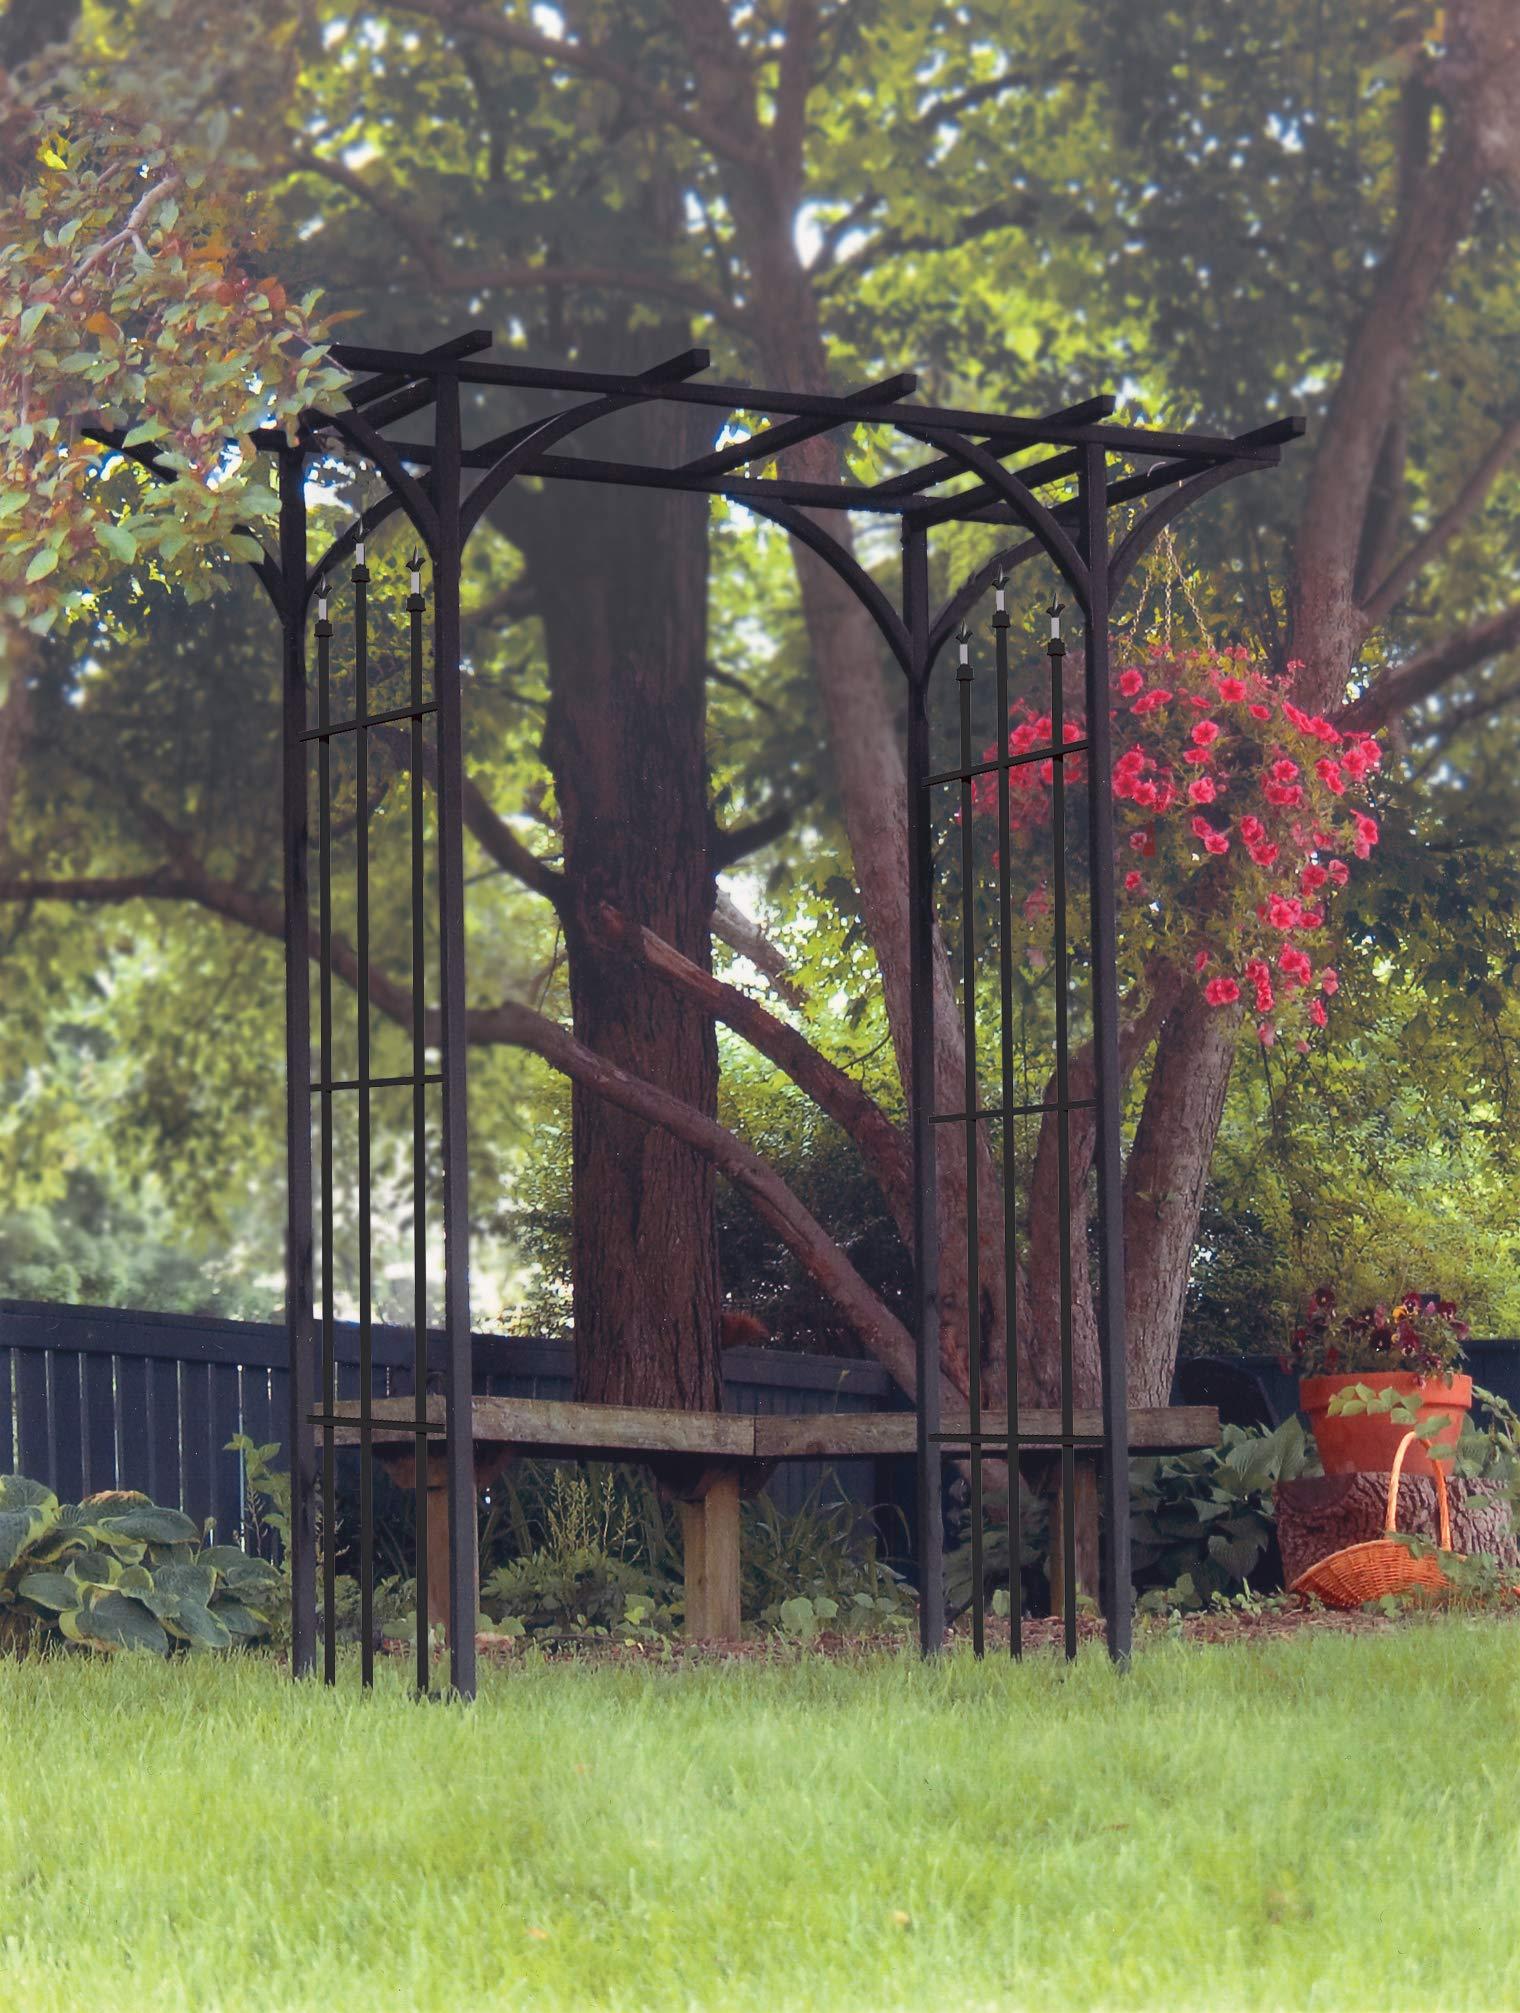 Panacea 89088 Steel Flat Top Arbor with Finials, Black